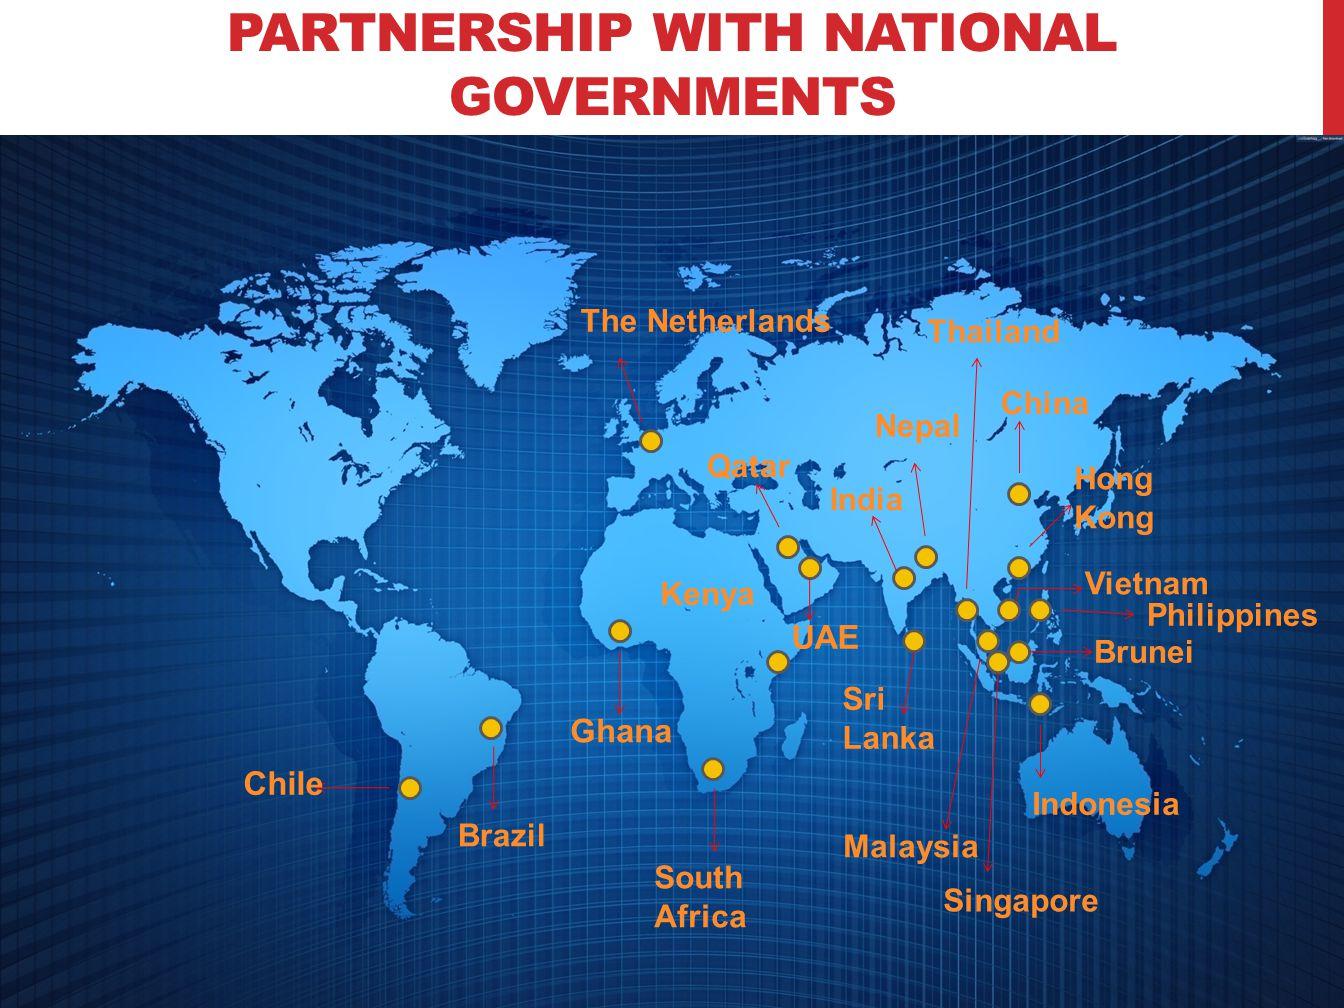 PARTNERSHIP WITH NATIONAL GOVERNMENTS UAE Qatar Nepal Sri Lanka The Netherlands South Africa Brazil India Indonesia Singapore Malaysia China Hong Kong